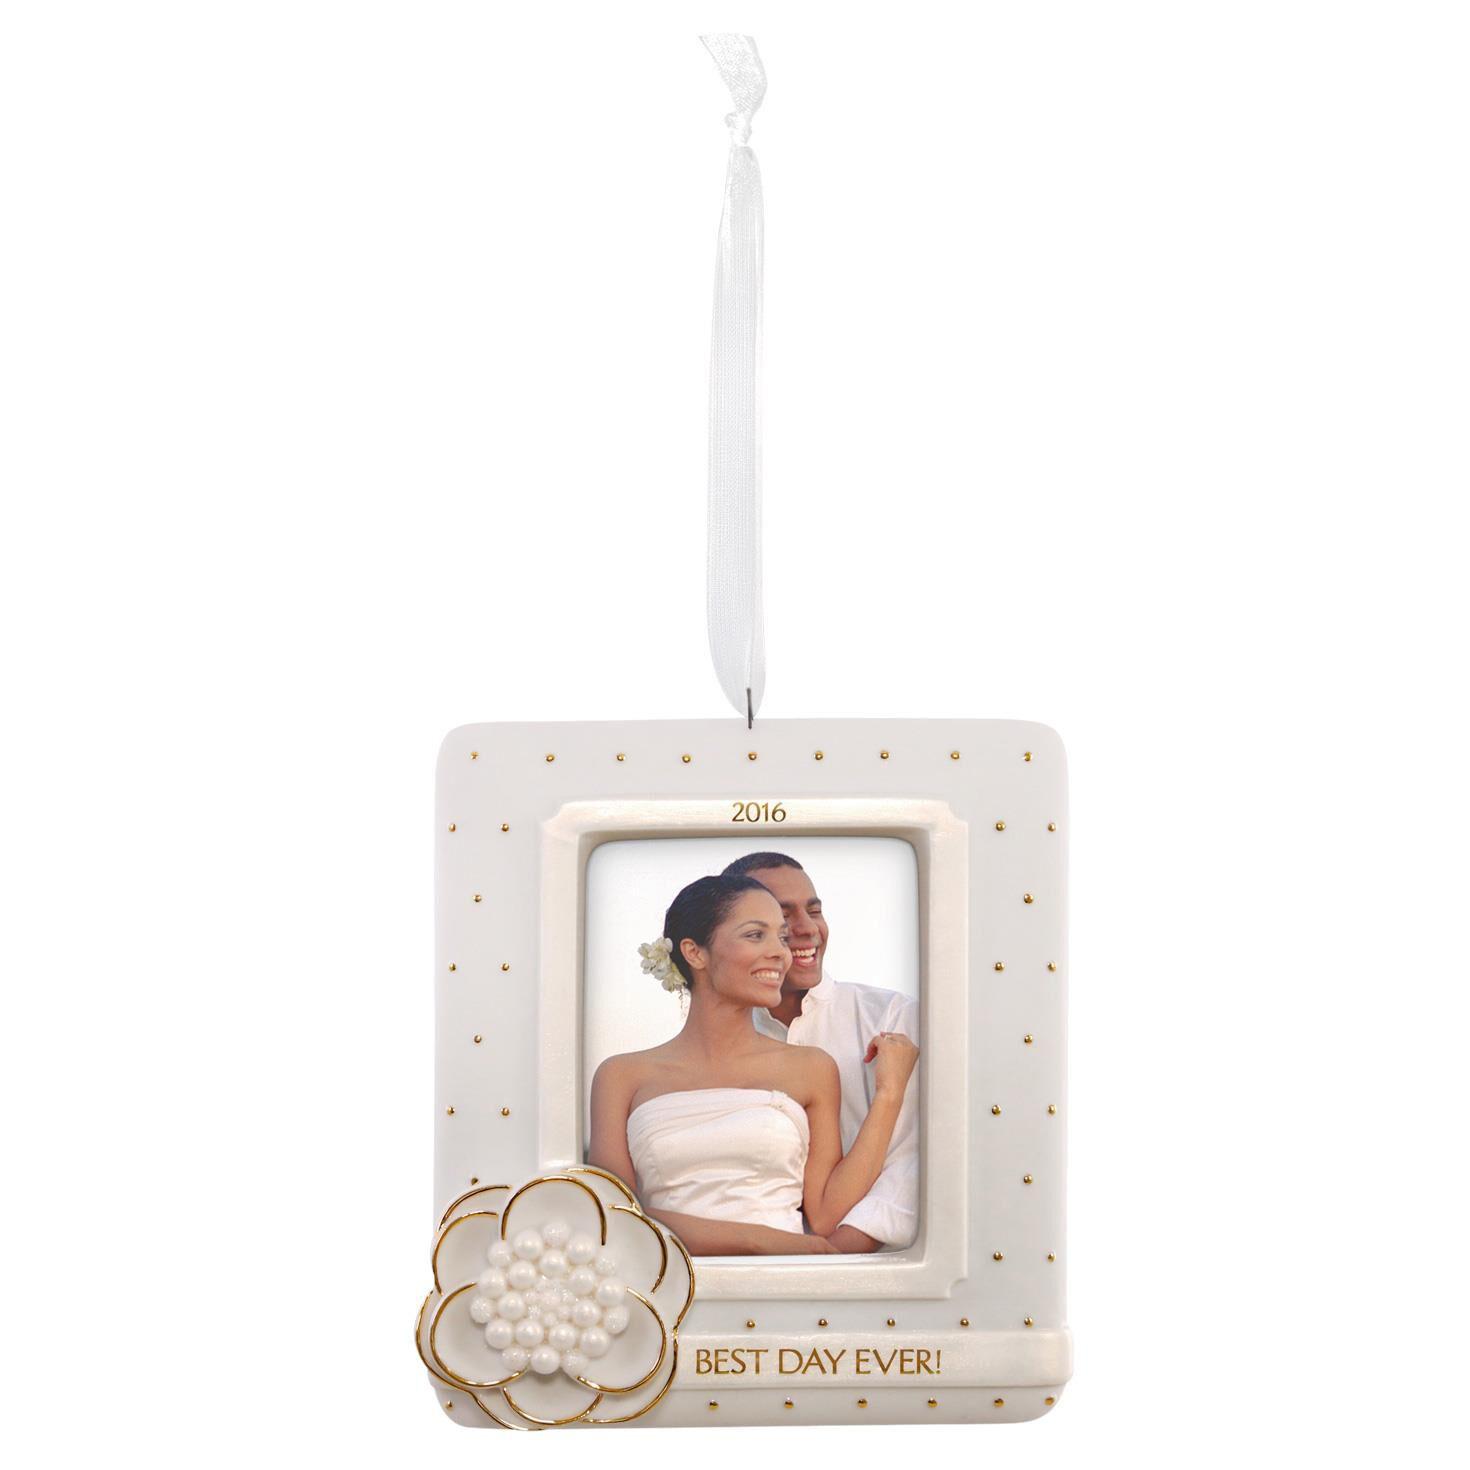 Hallmark Wedding Gifts Choice Image Wedding Decoration Ideas Wedding Photo  Holder Ornament Keepsake Ornaments Hallmark Cenypradufo